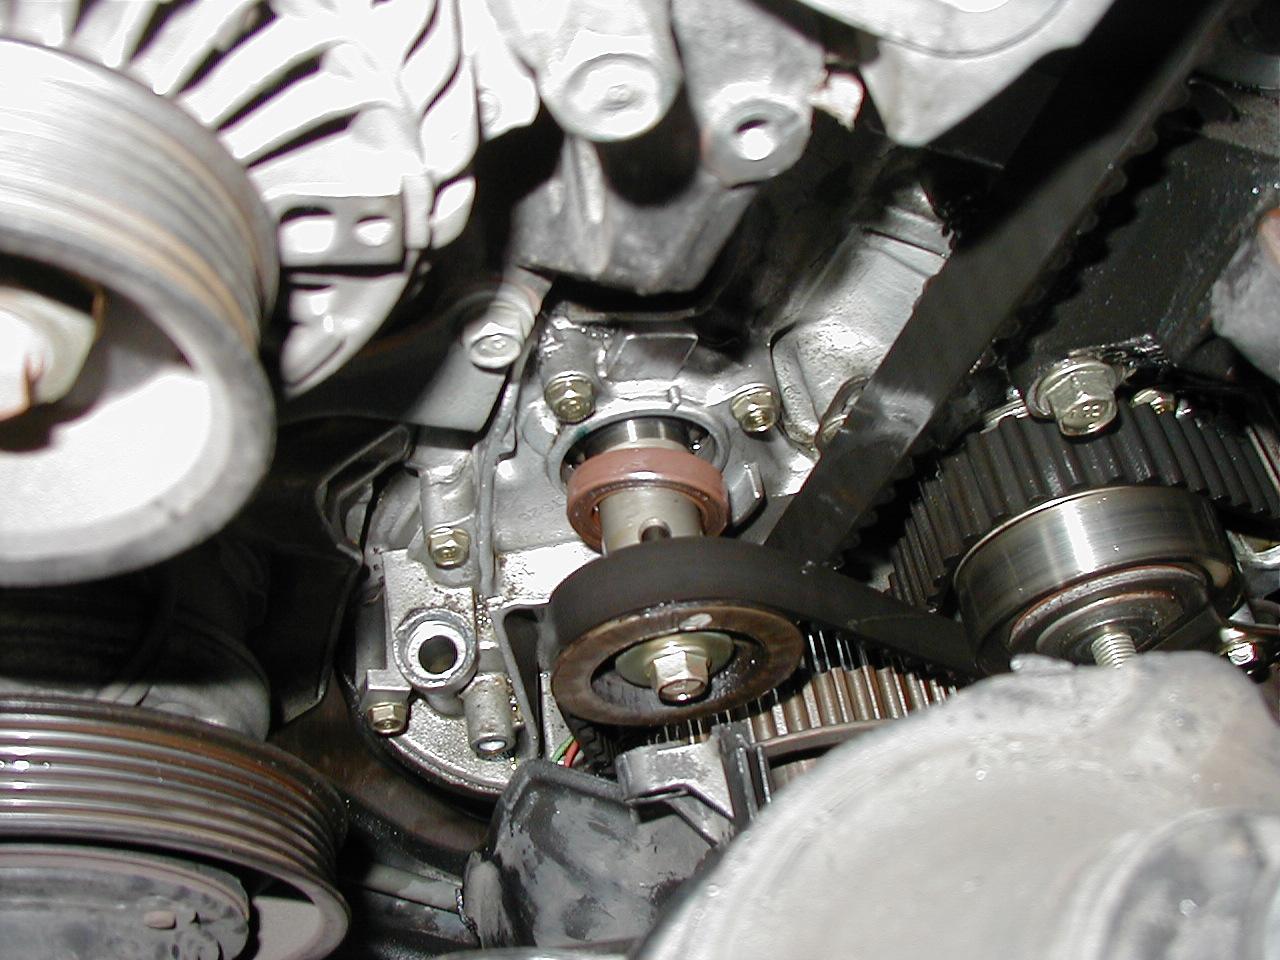 I Have A 1999 4 Cylinder Vtec Honda Accord I Just Got